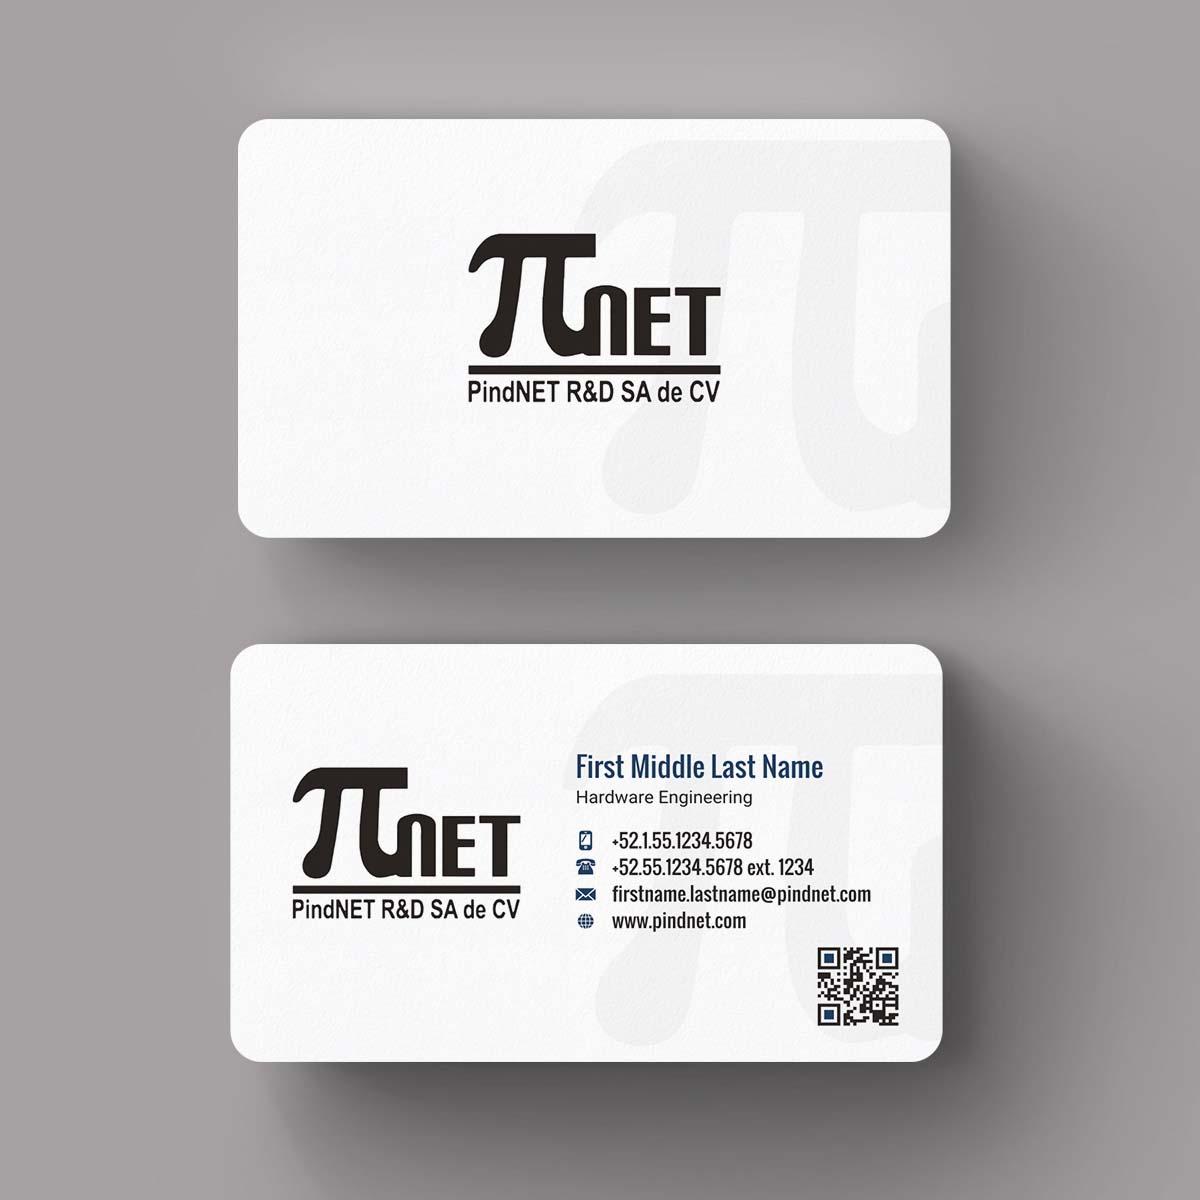 Modern upmarket information technology business card design for business card design by indianashok for pindnet rd sa de cv design 10822275 colourmoves